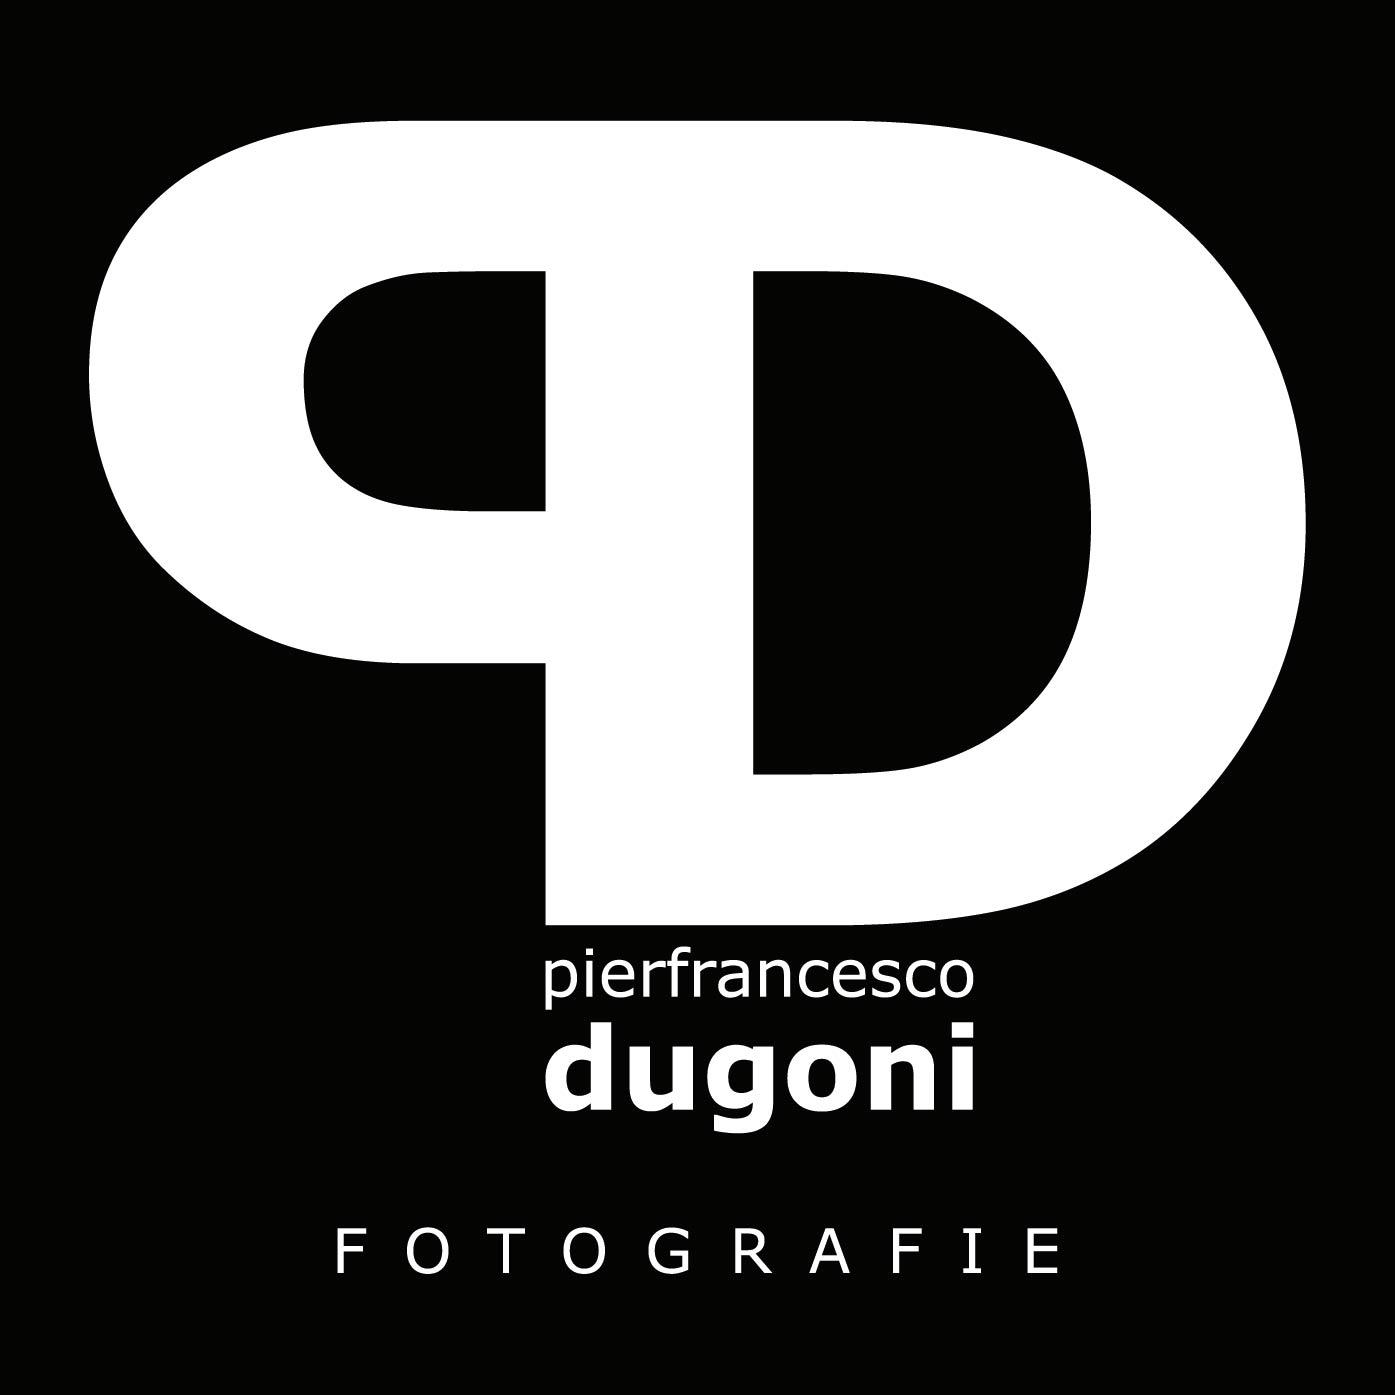 Pierfrancesco Dugoni - fotografo freelance